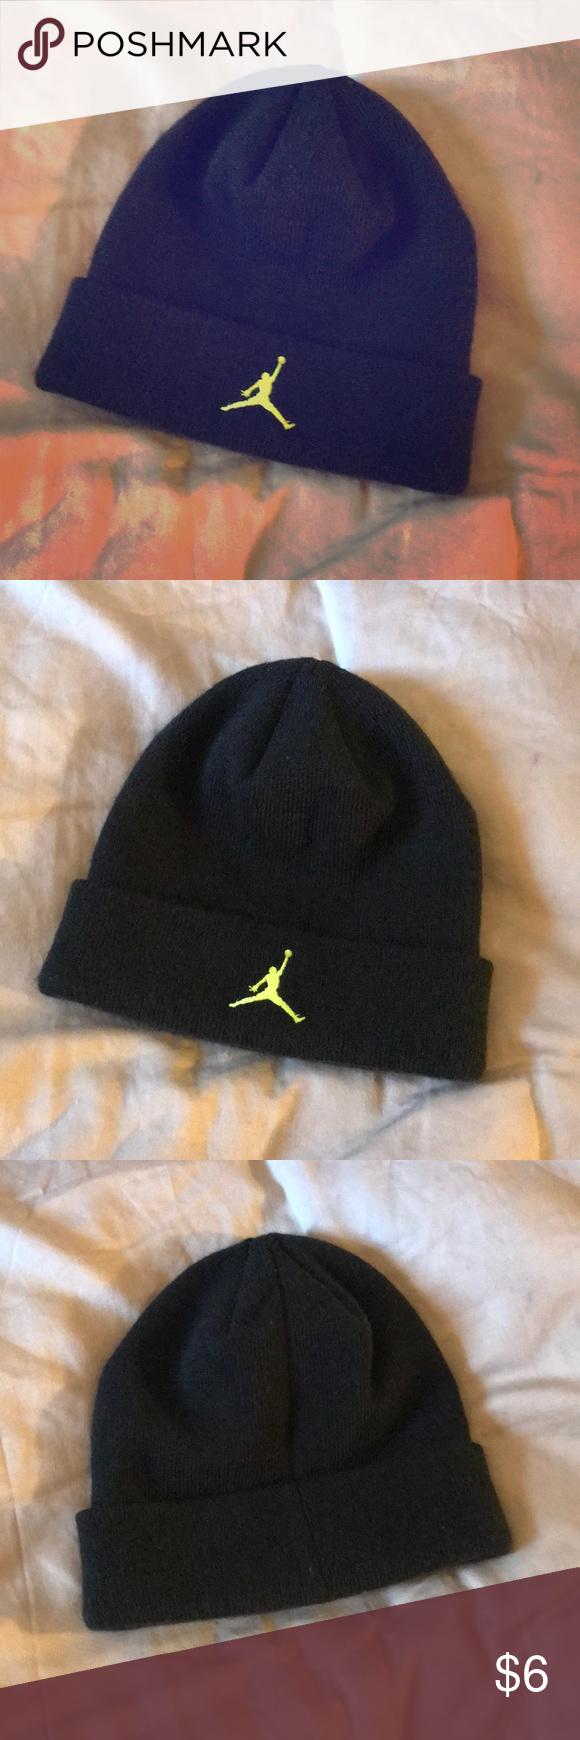 dfb1c44c2d9b6c Youth Jordan Stocking Cap Winter Hat Worn a couple of times. Still in very